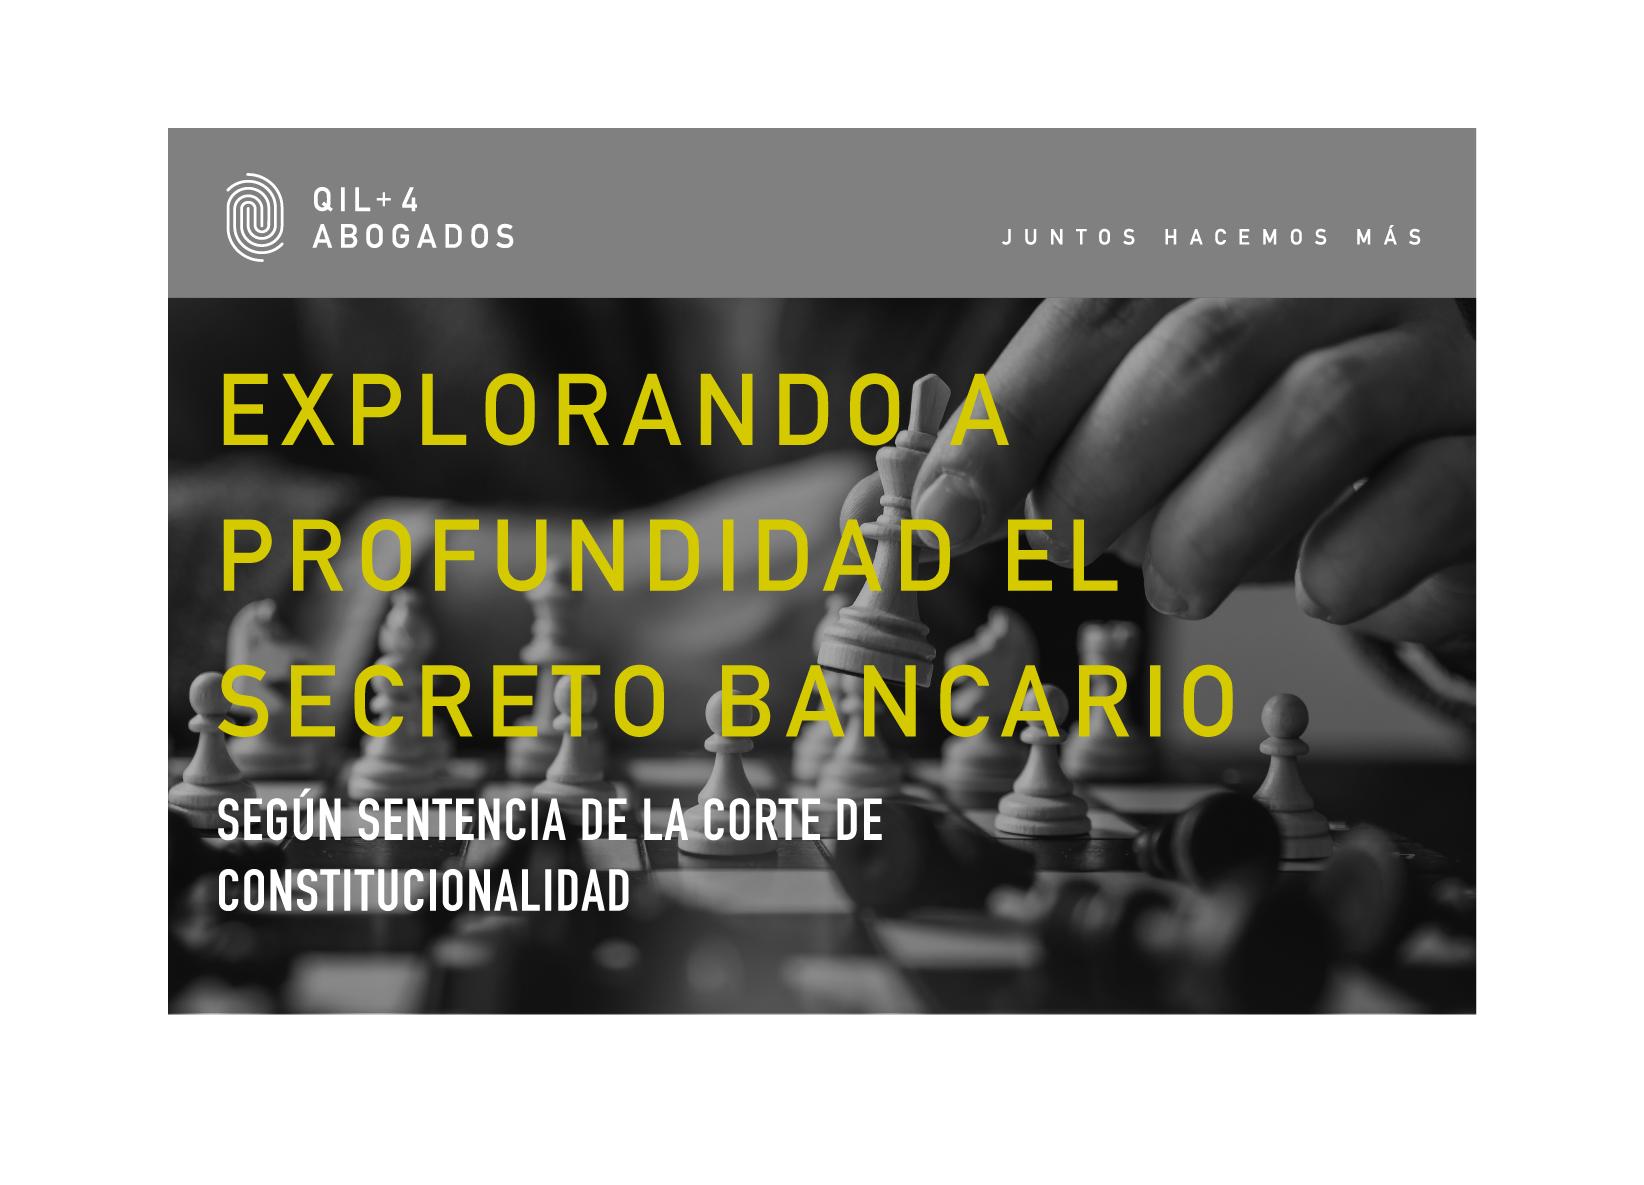 SECRETO_BANCARIO-01.png